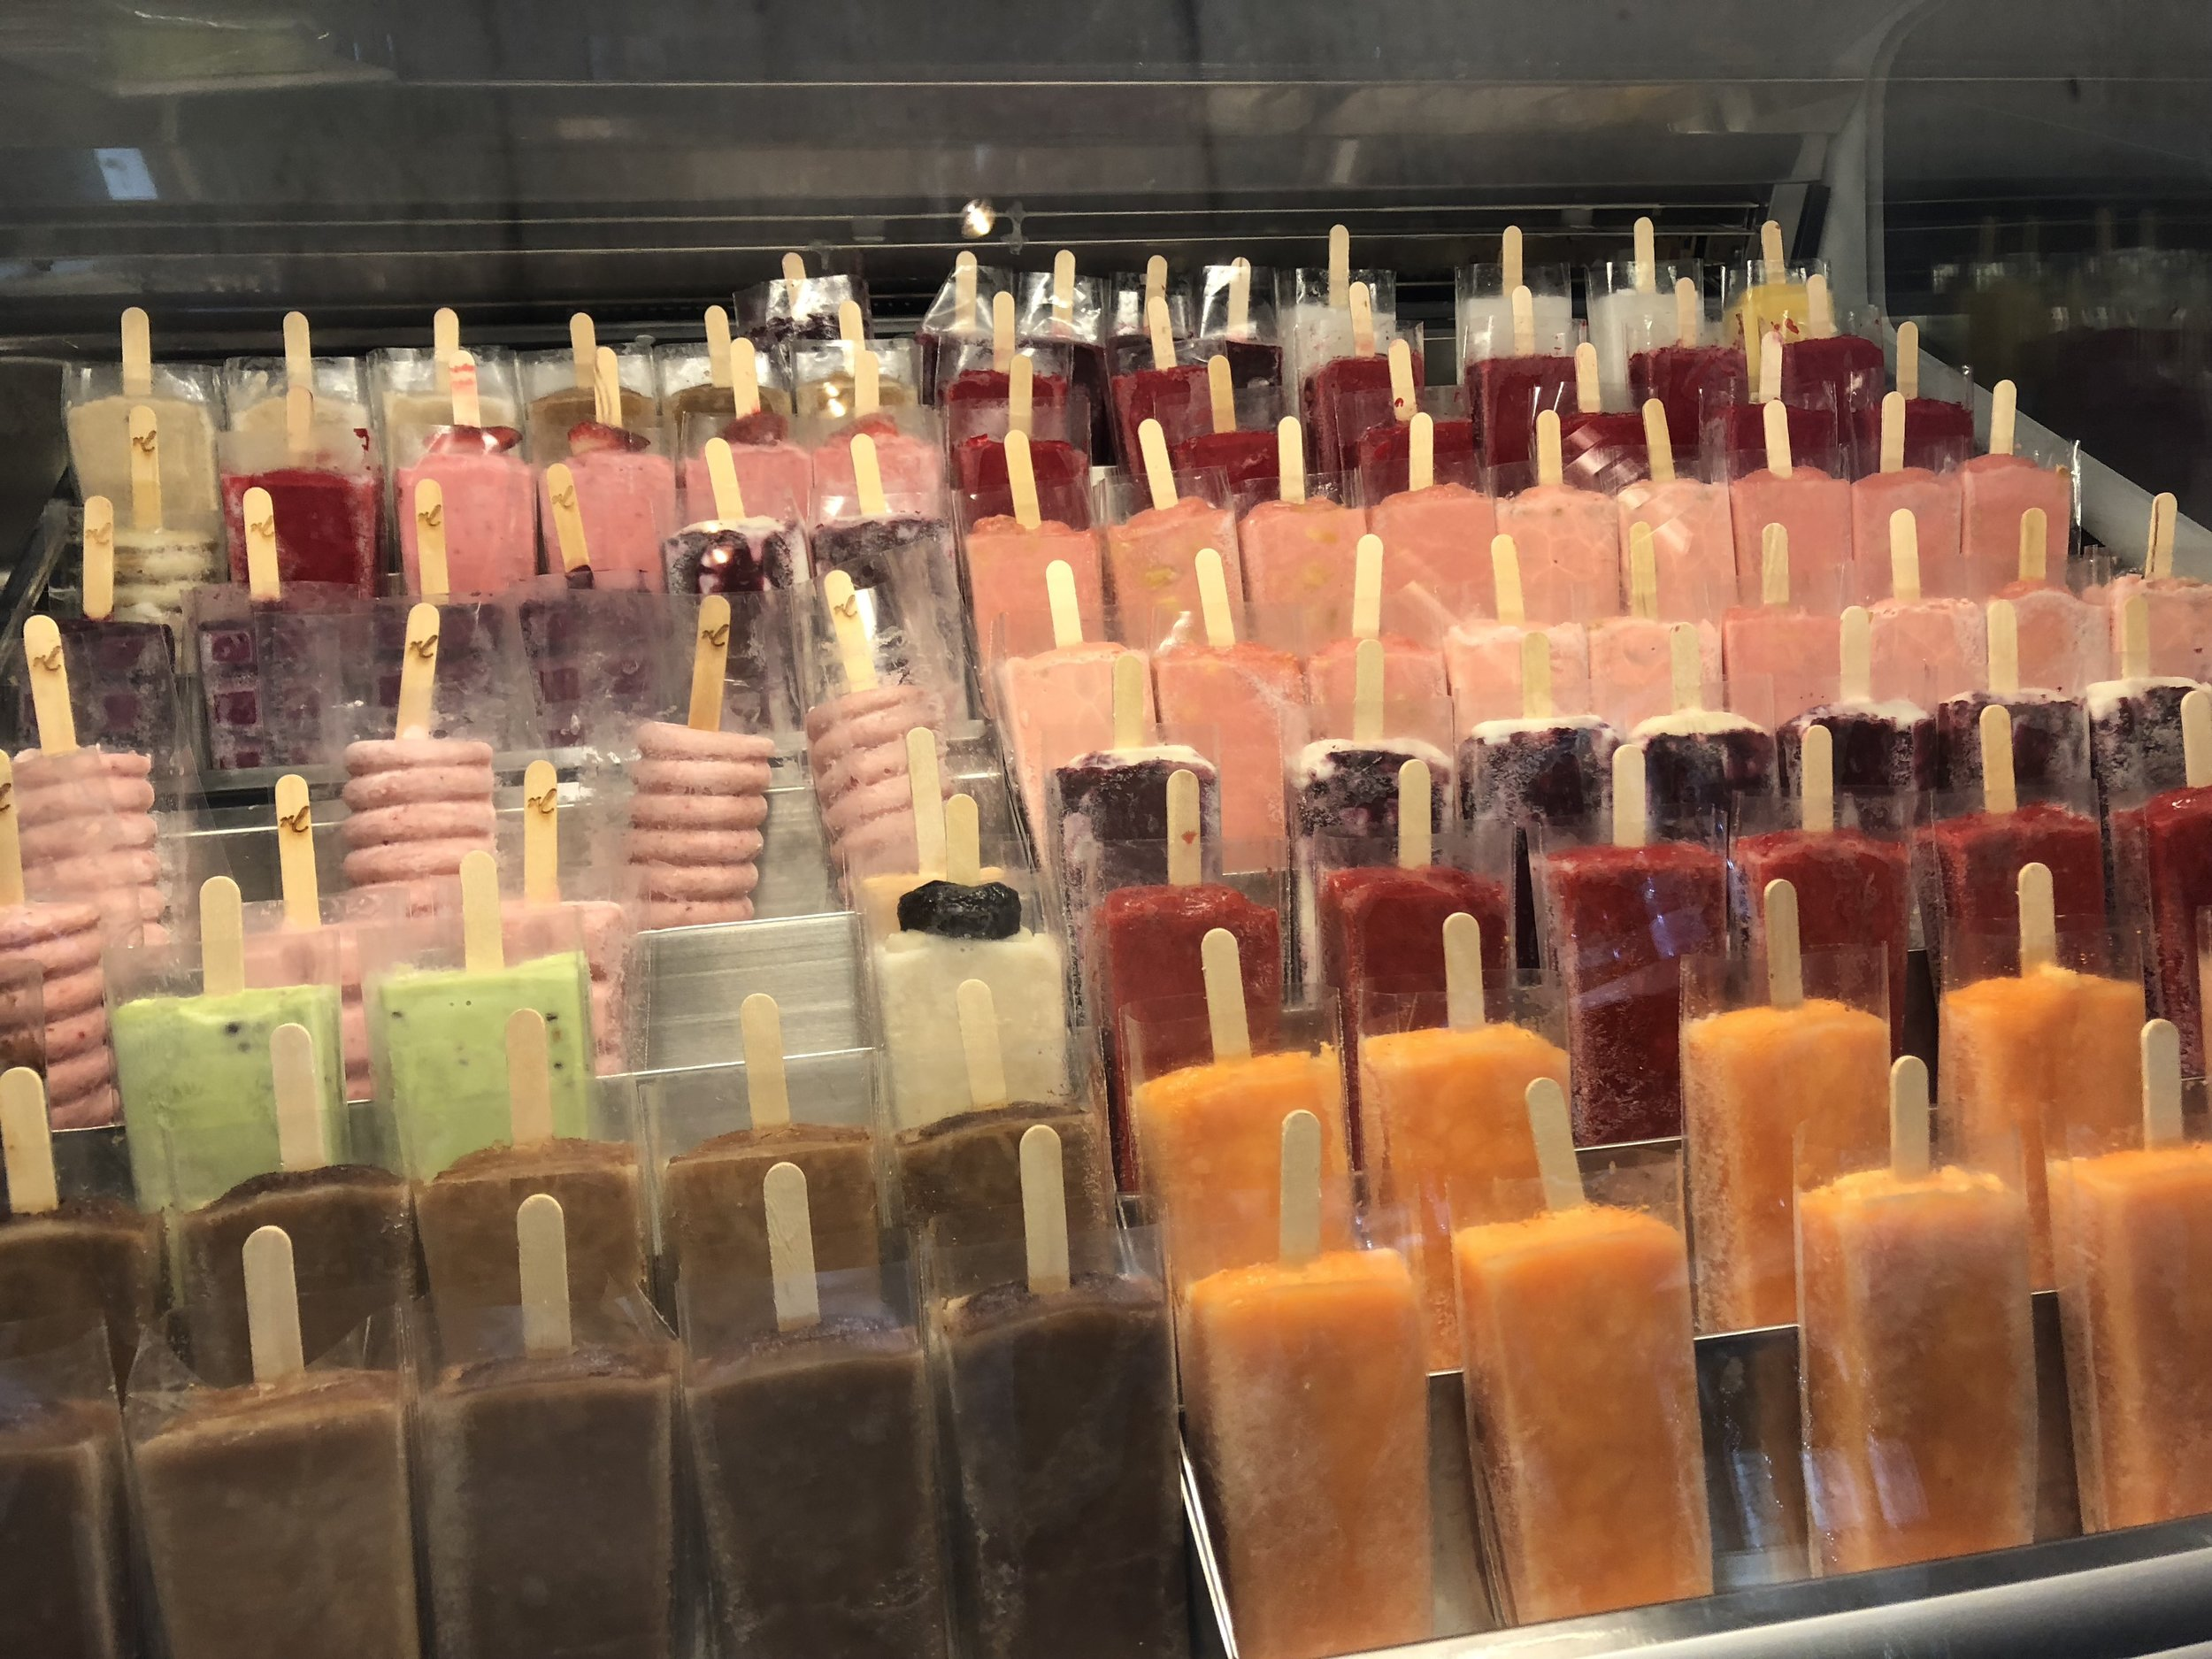 Paletas (popsicles)